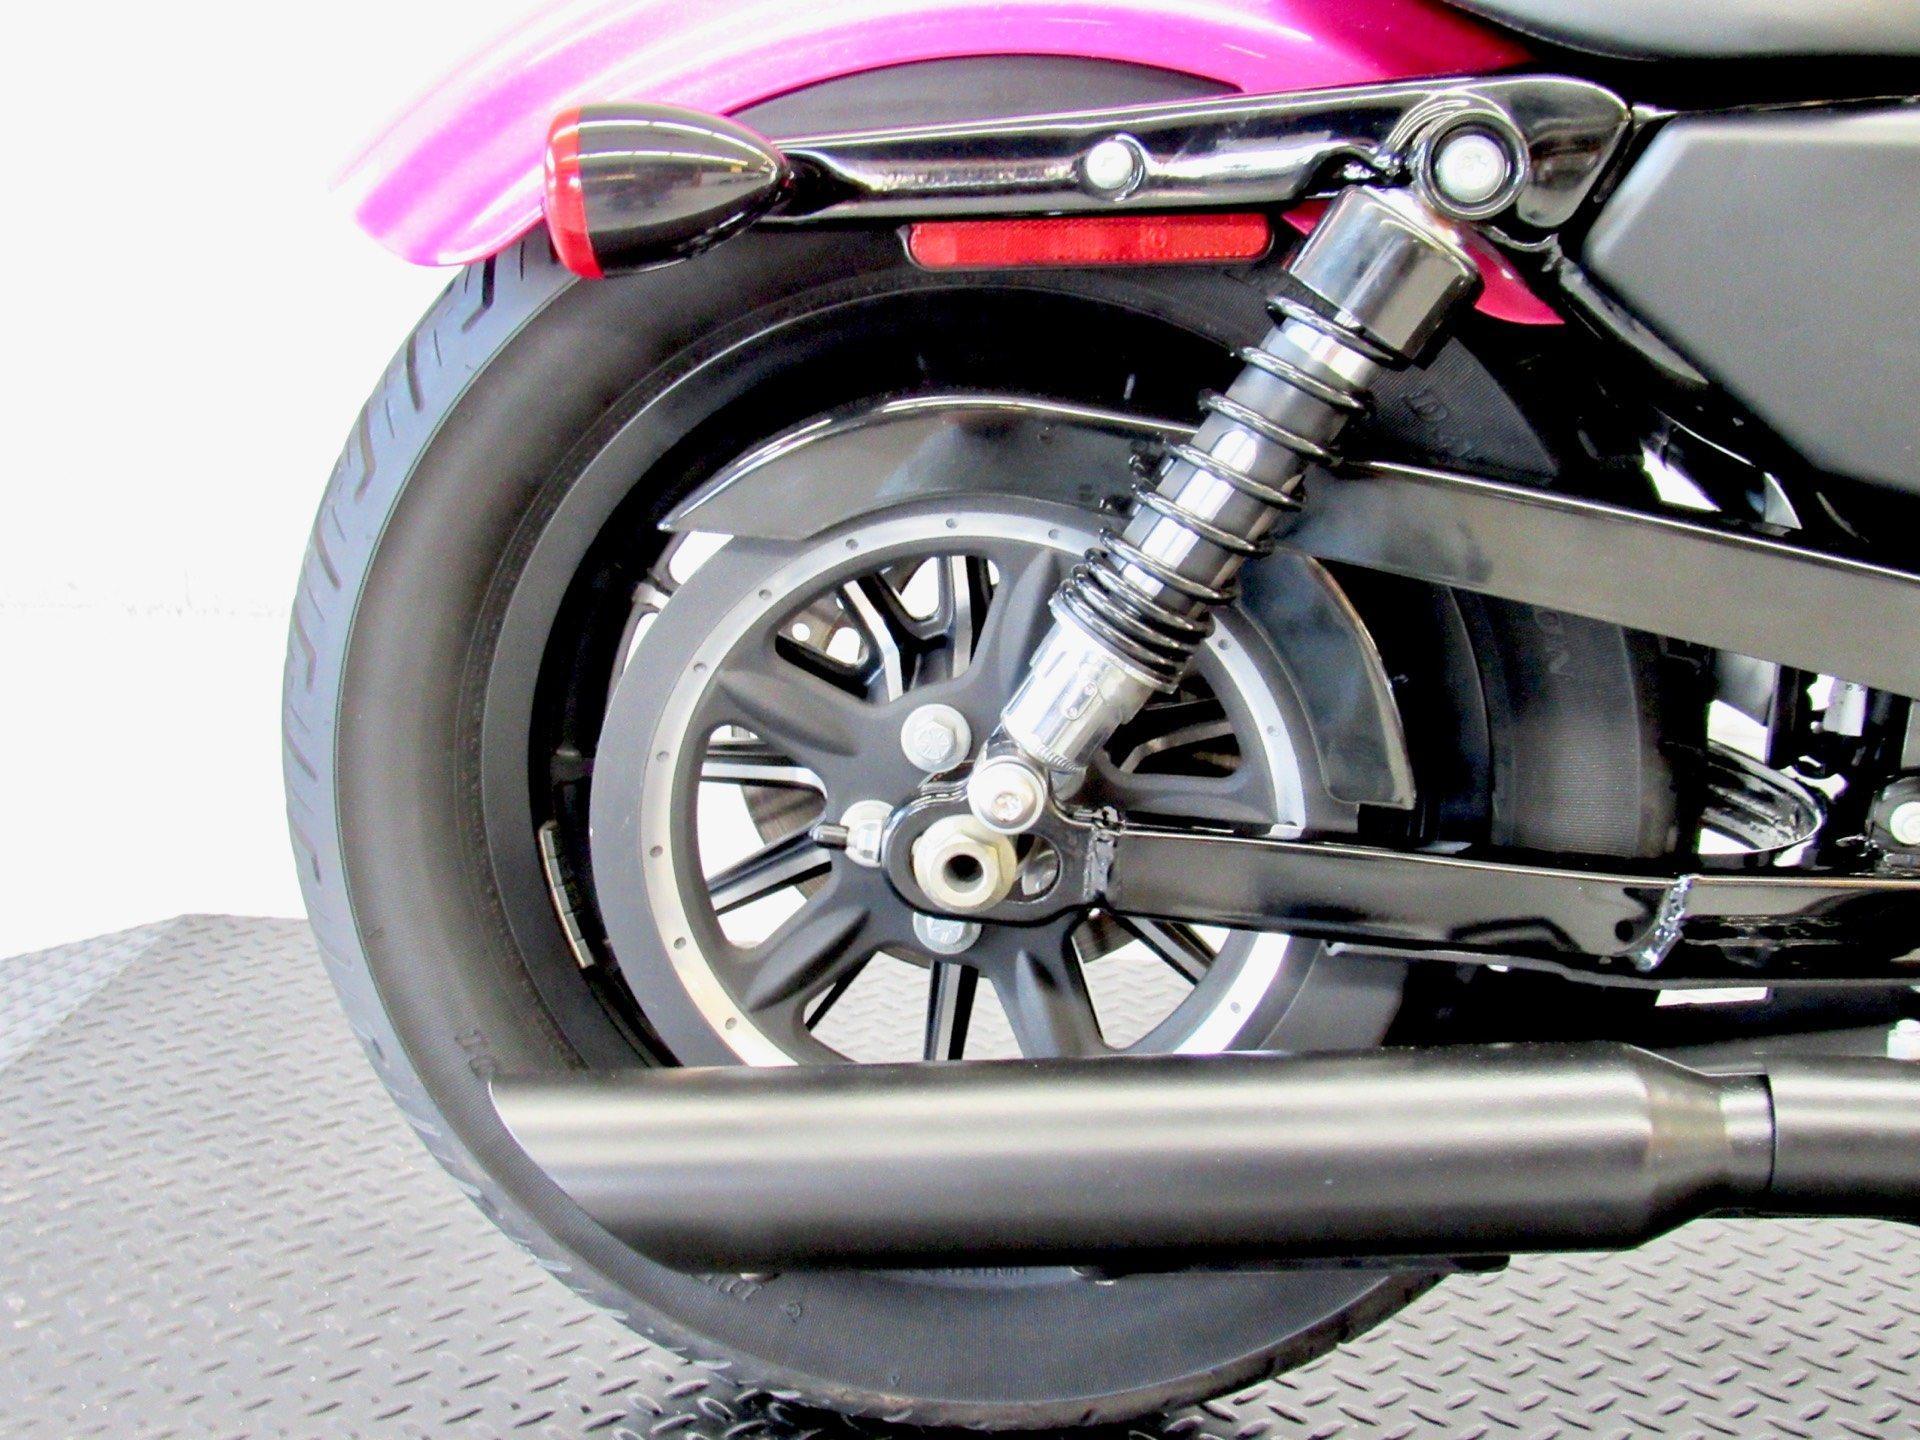 2011 Harley-Davidson Sportster® Iron 883™ in Fredericksburg, Virginia